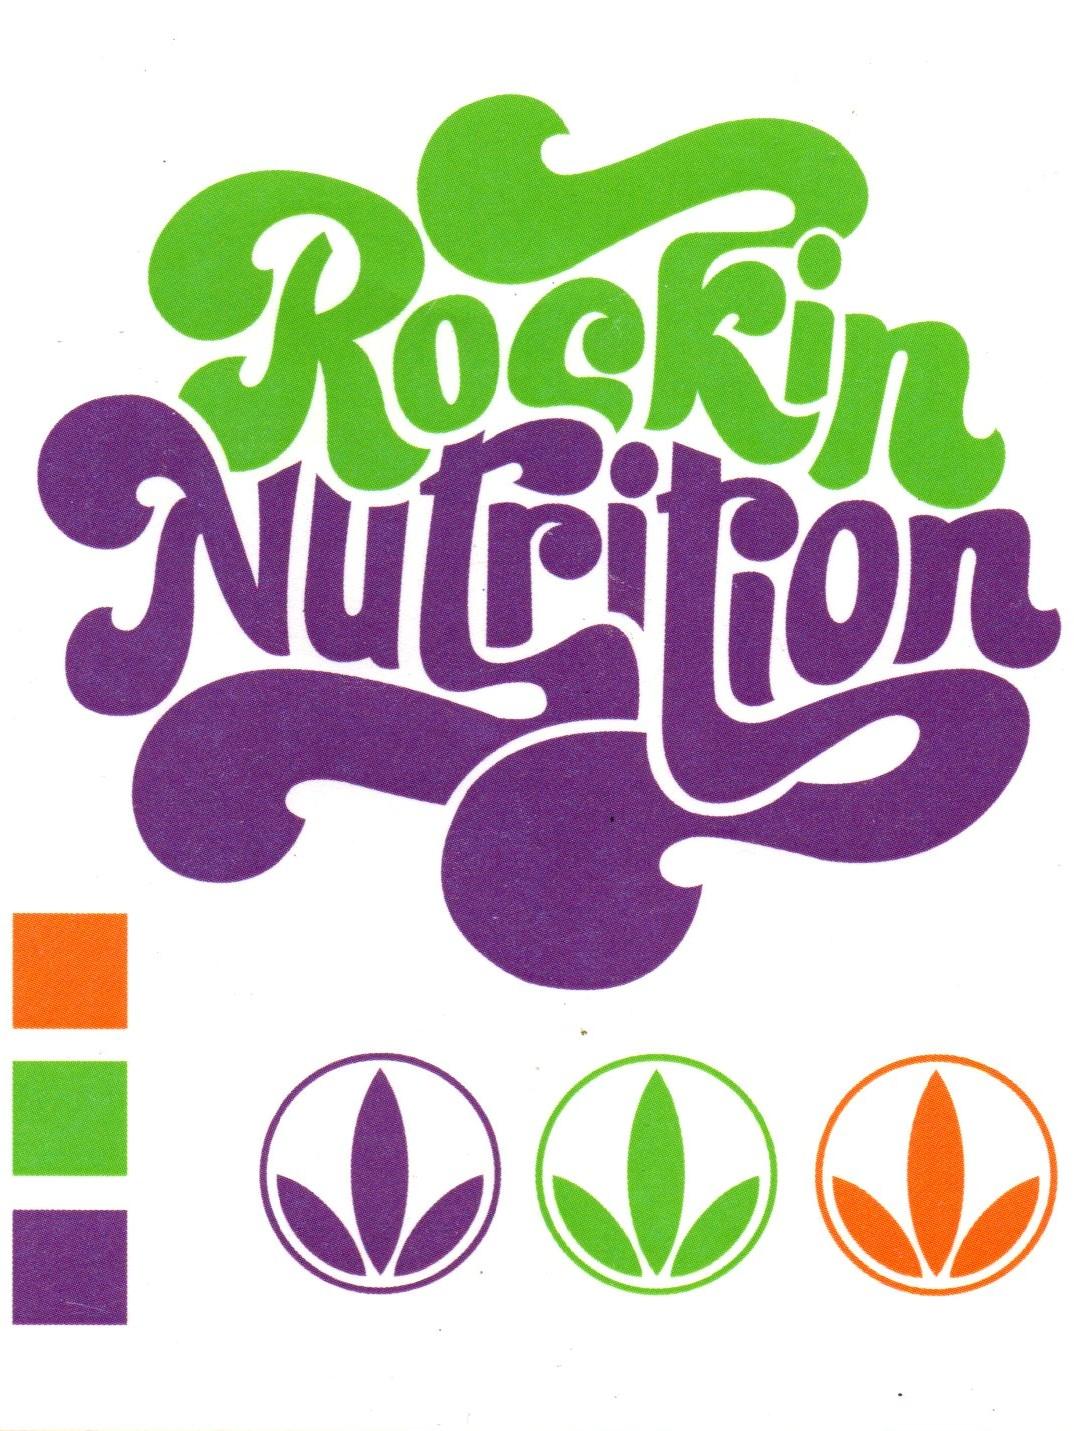 Rockin Nutrition